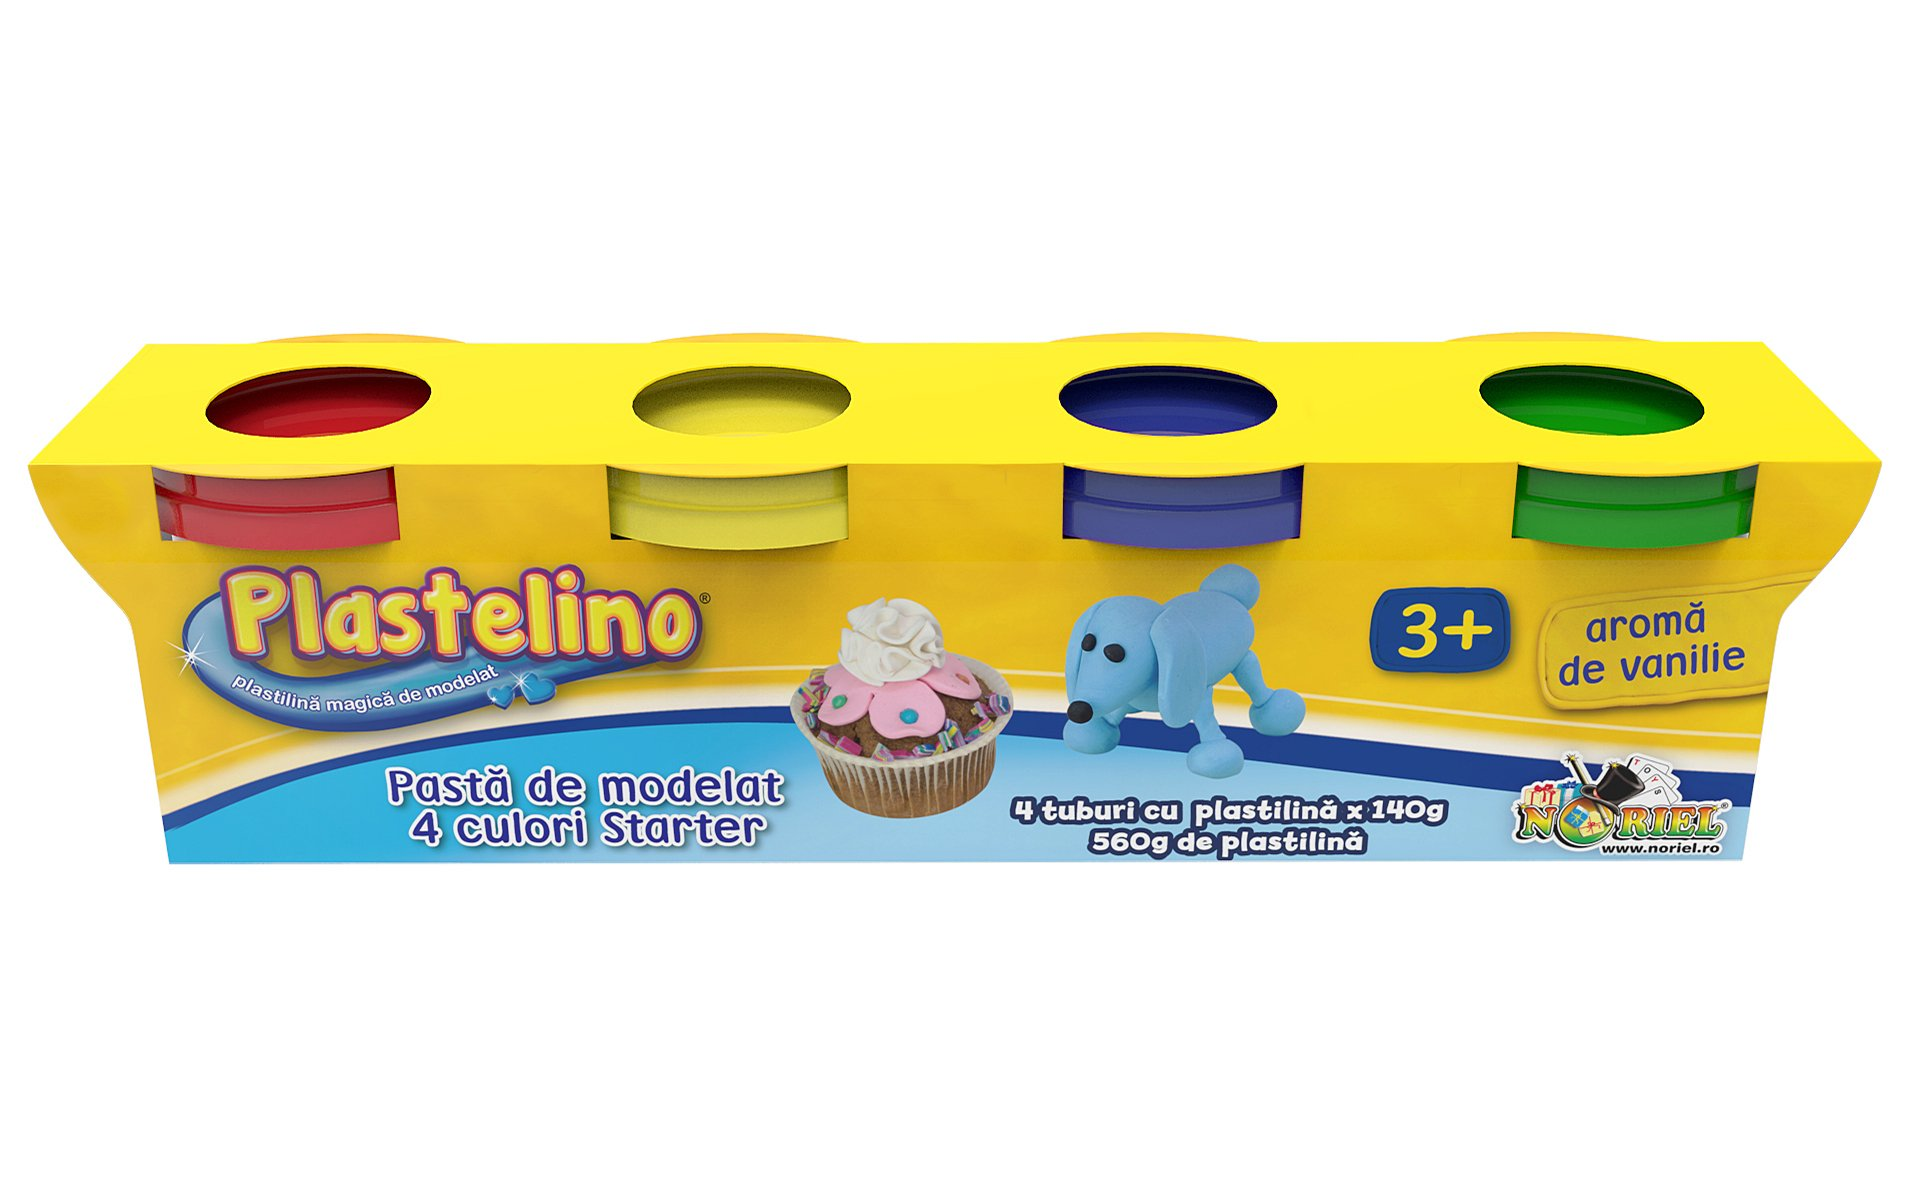 Plastelino - Pasta de modelat starter 4 culori II